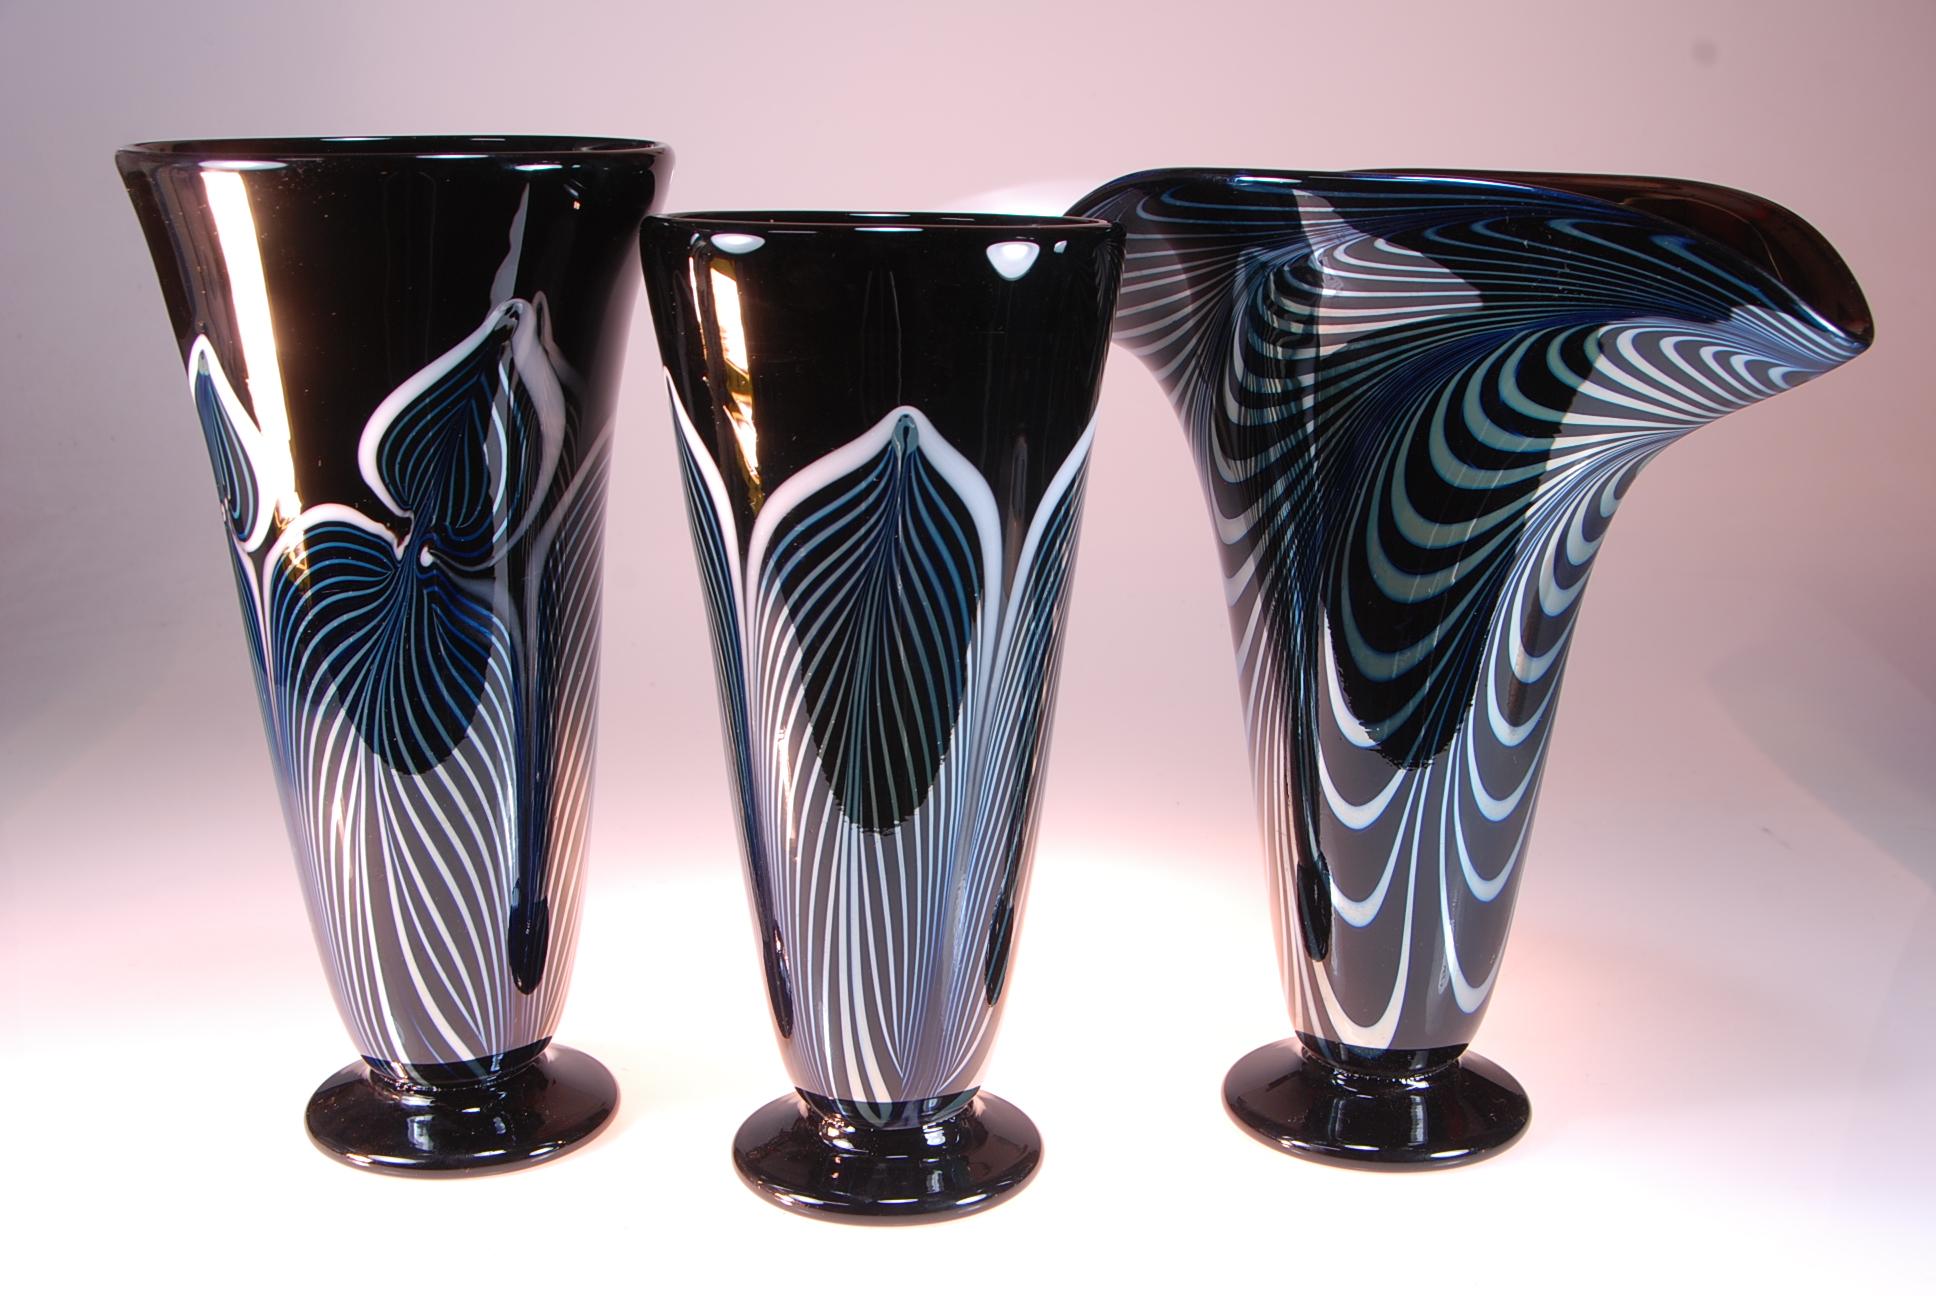 Black Vase group